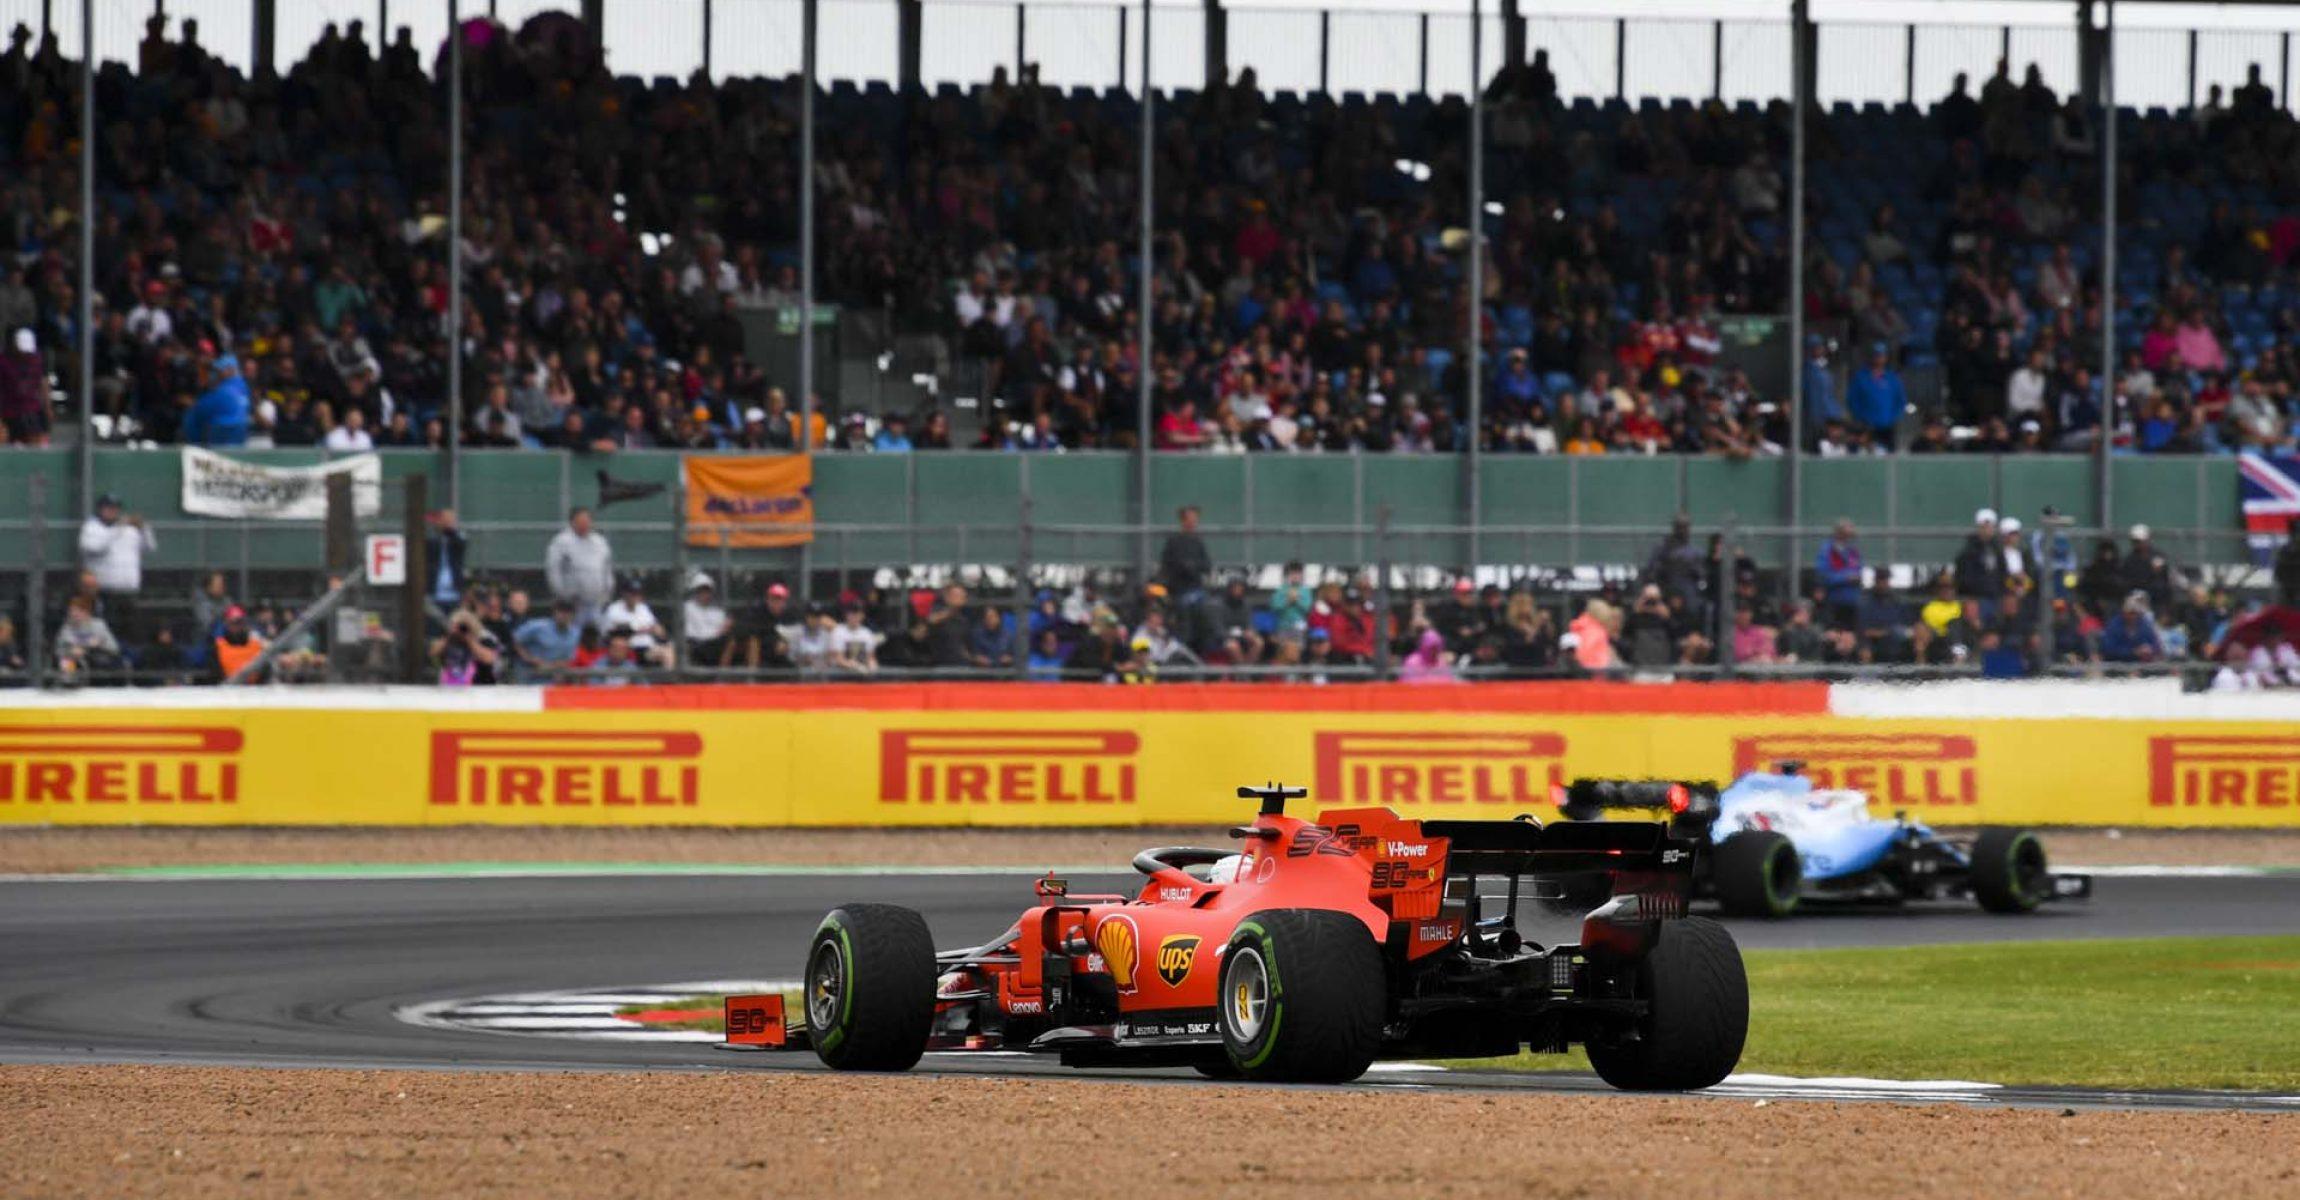 SILVERSTONE, UNITED KINGDOM - JULY 13: Sebastian Vettel, Ferrari SF90 during the British GP at Silverstone on July 13, 2019 in Silverstone, United Kingdom. (Photo by Mark Sutton / LAT Images)